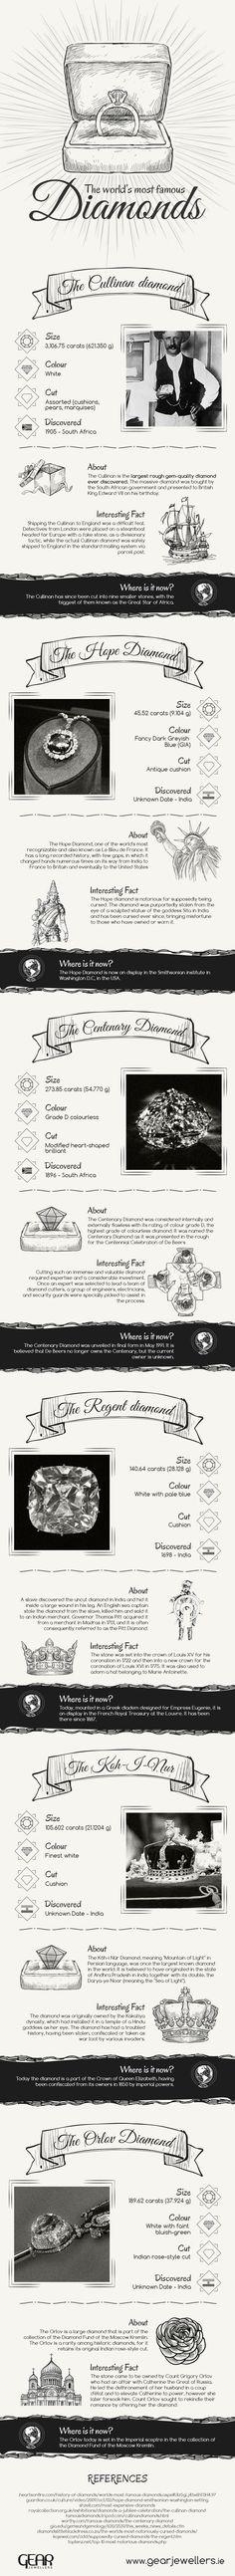 The World's Most Famous Diamonds #diamondfacts #infographic #diamond #HeartInDiamond